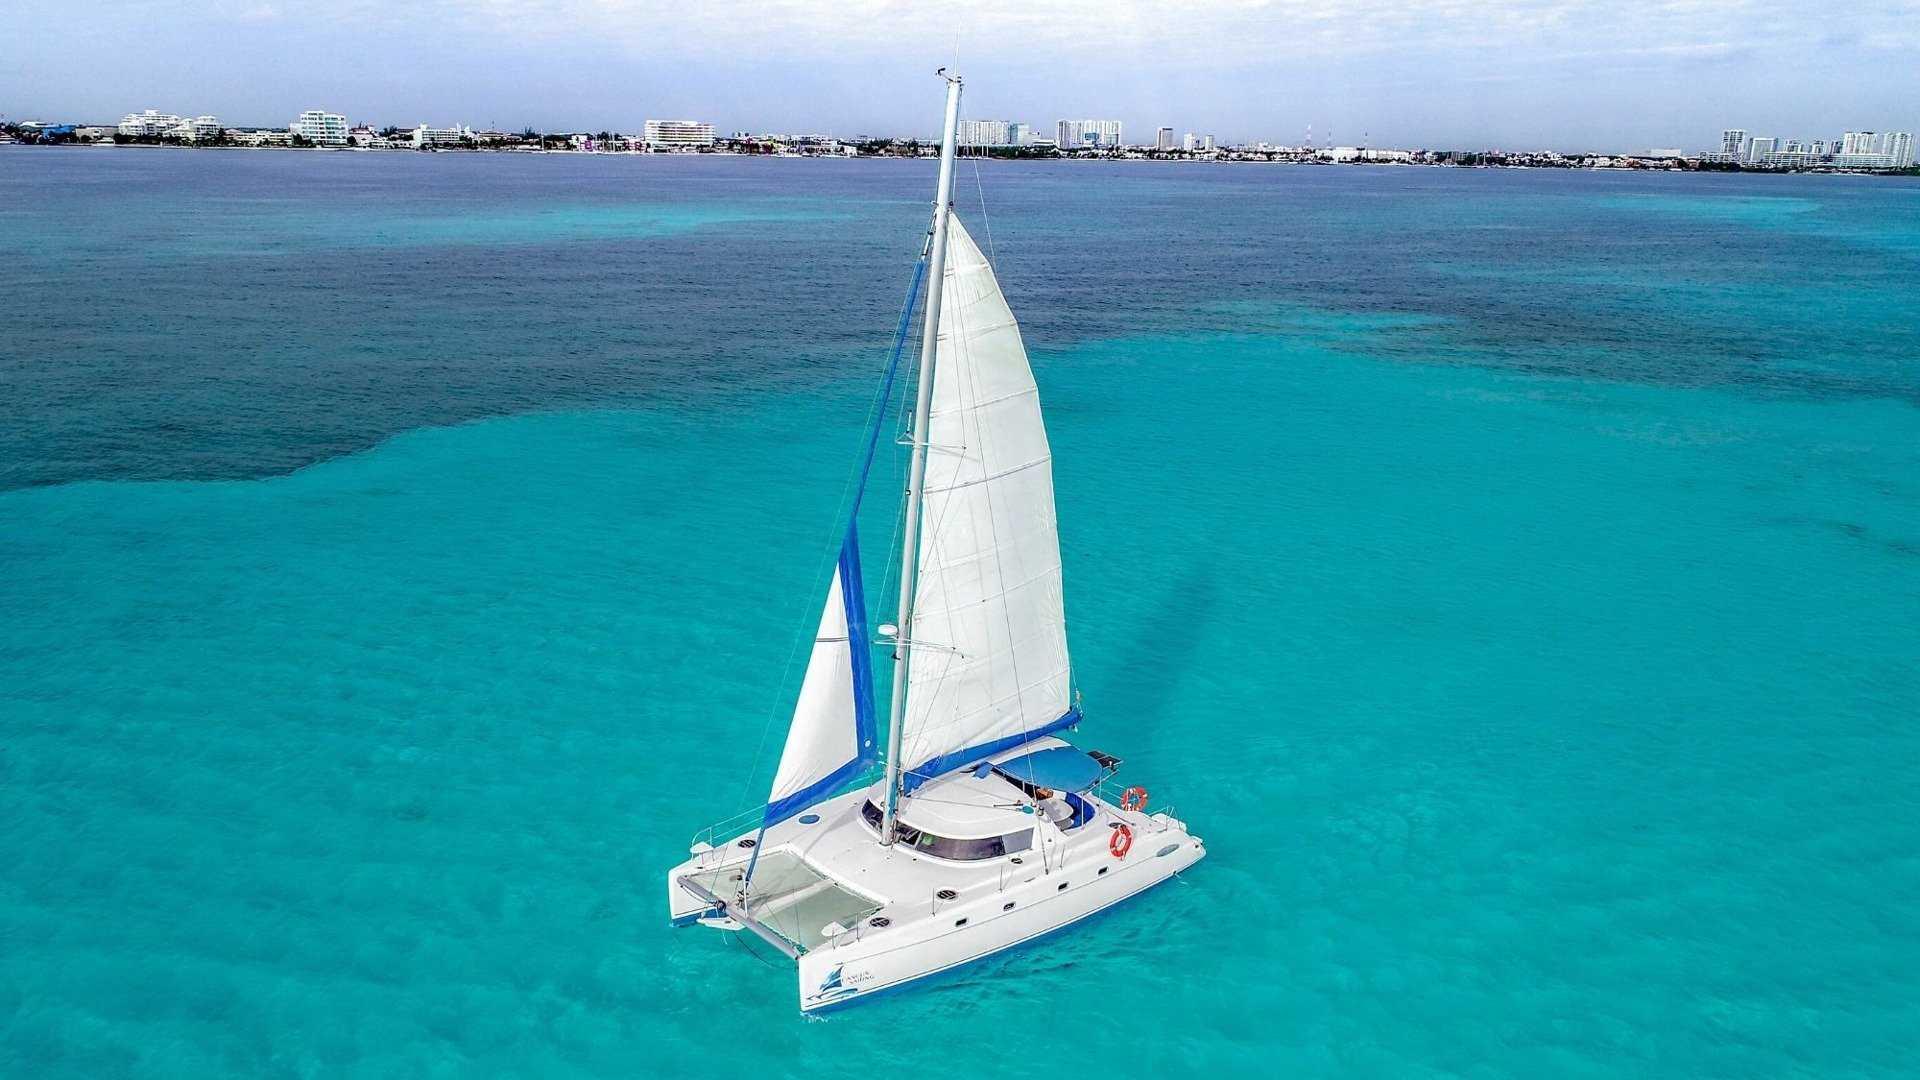 6 - LoRes - 4 Vents - Isla Mujeres Catamaran Tour - Cancun Sailing